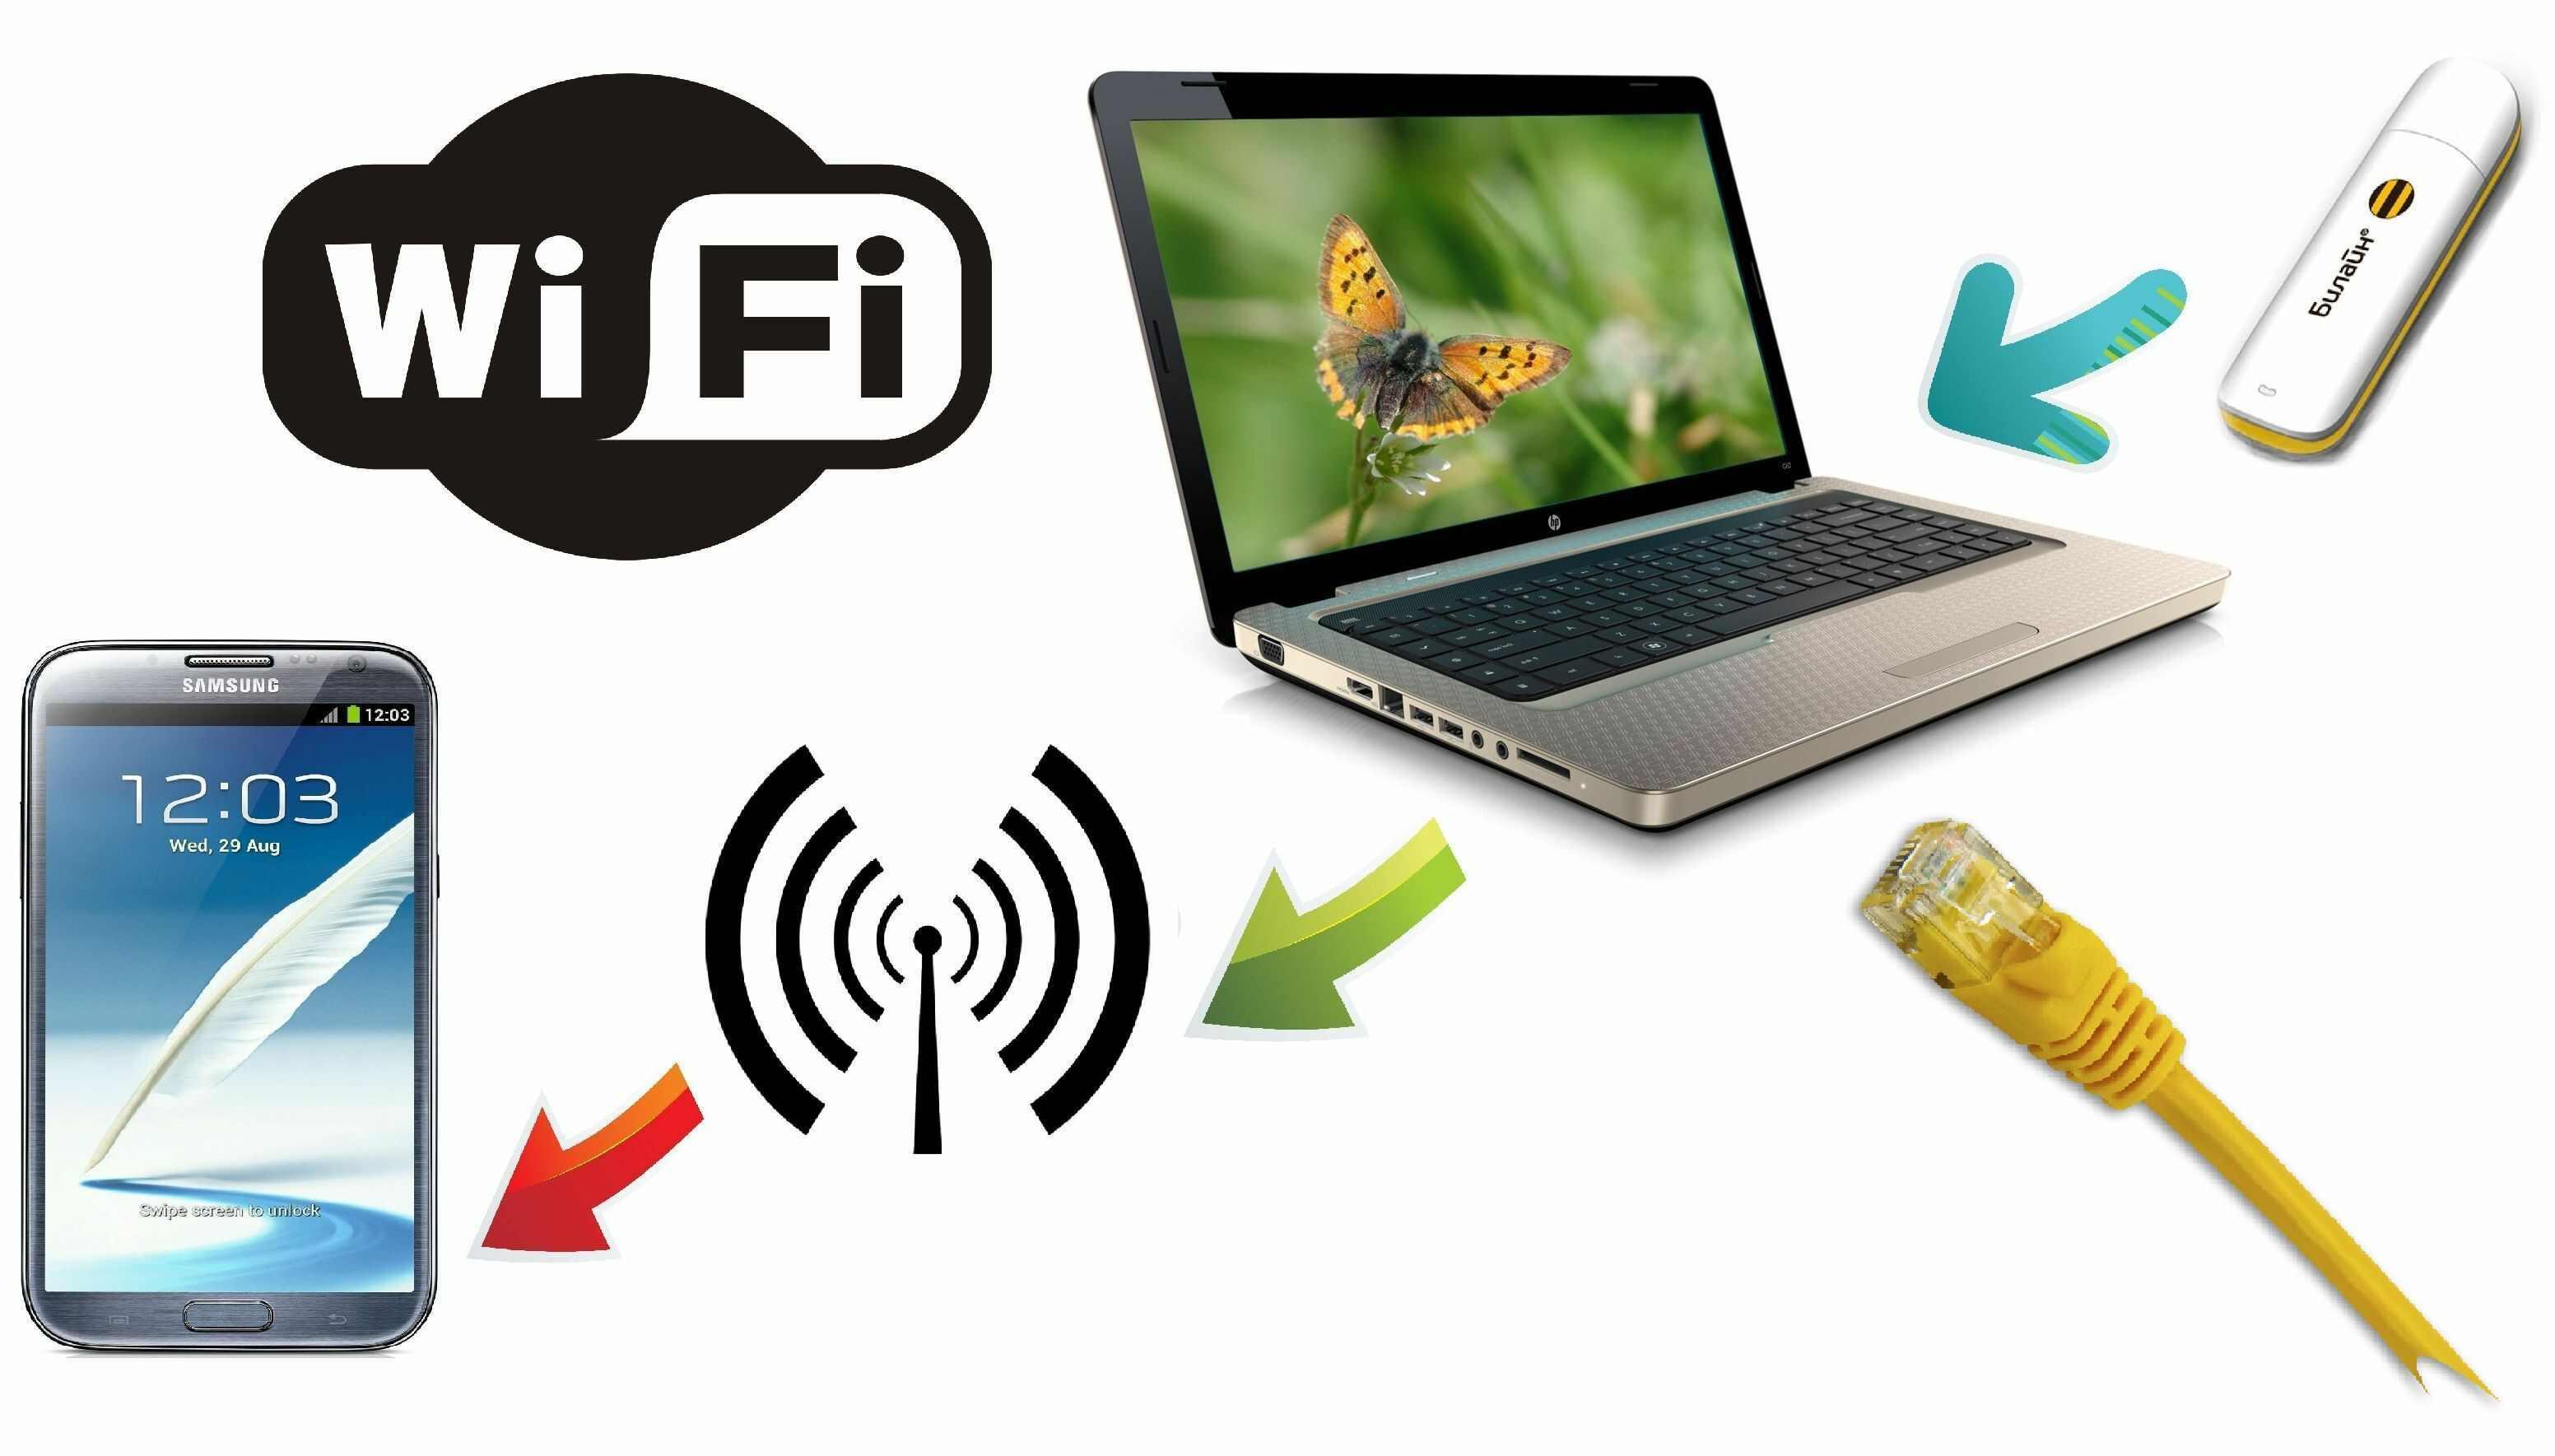 Что такое wi-fi (вай фай) - для новичков